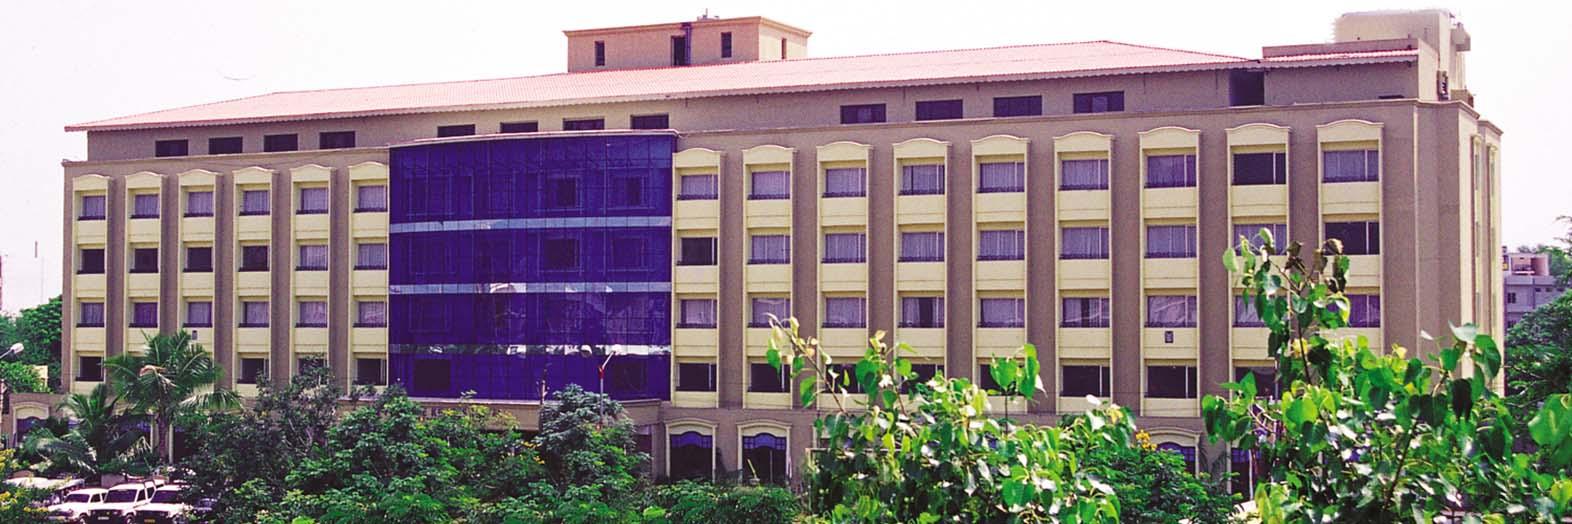 Hotels in Tirupati, Fortune Kences, Tirupati